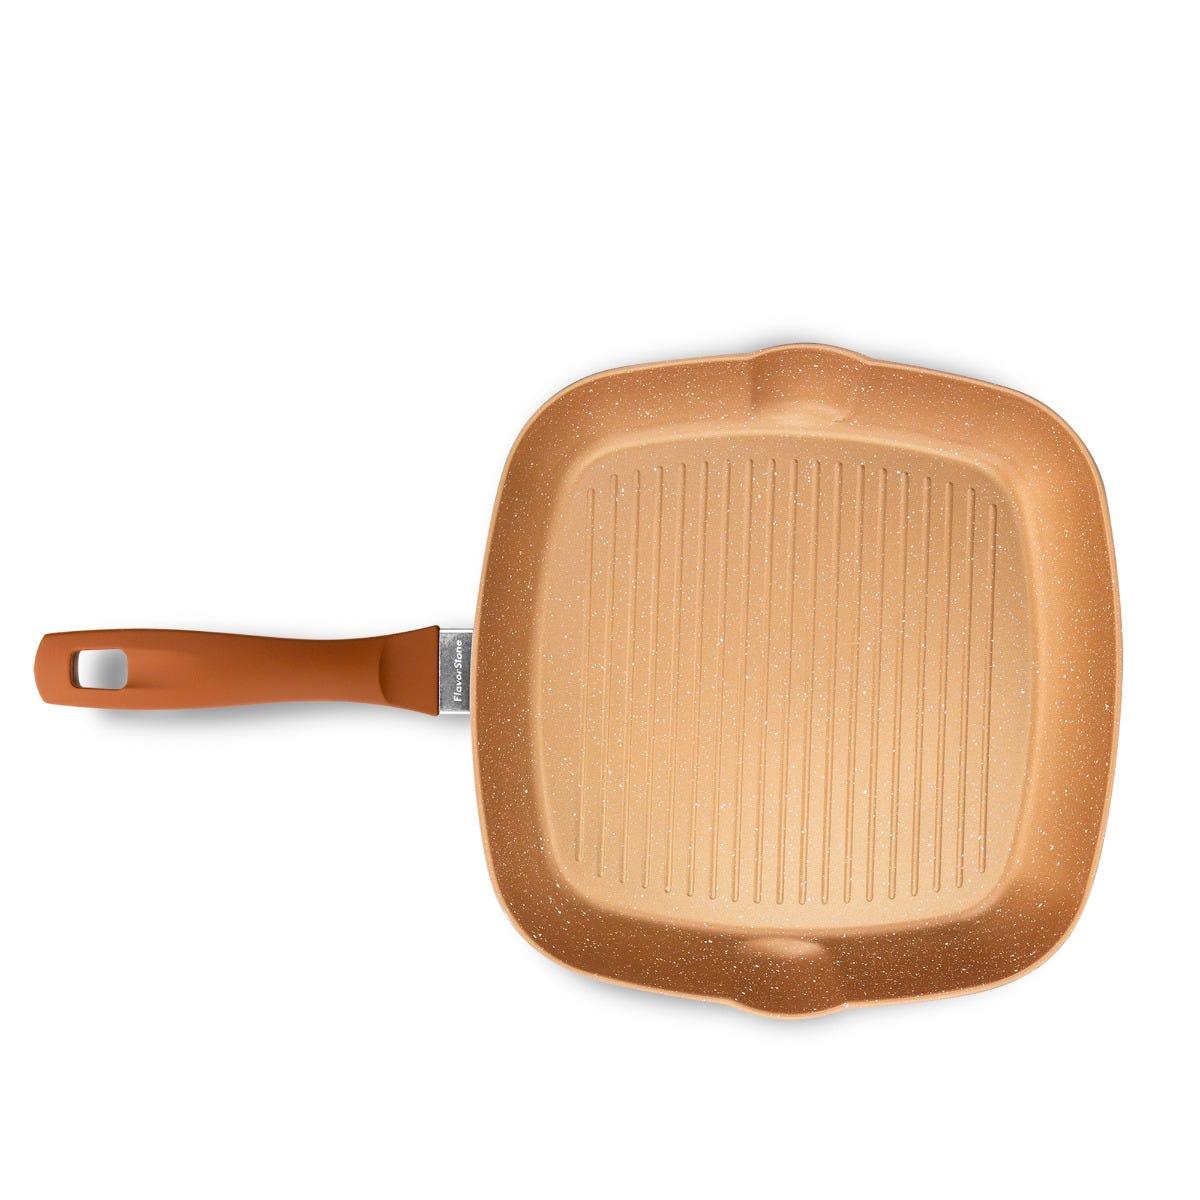 Sartén grill Flavorstone® Copper de 28 x28 cm